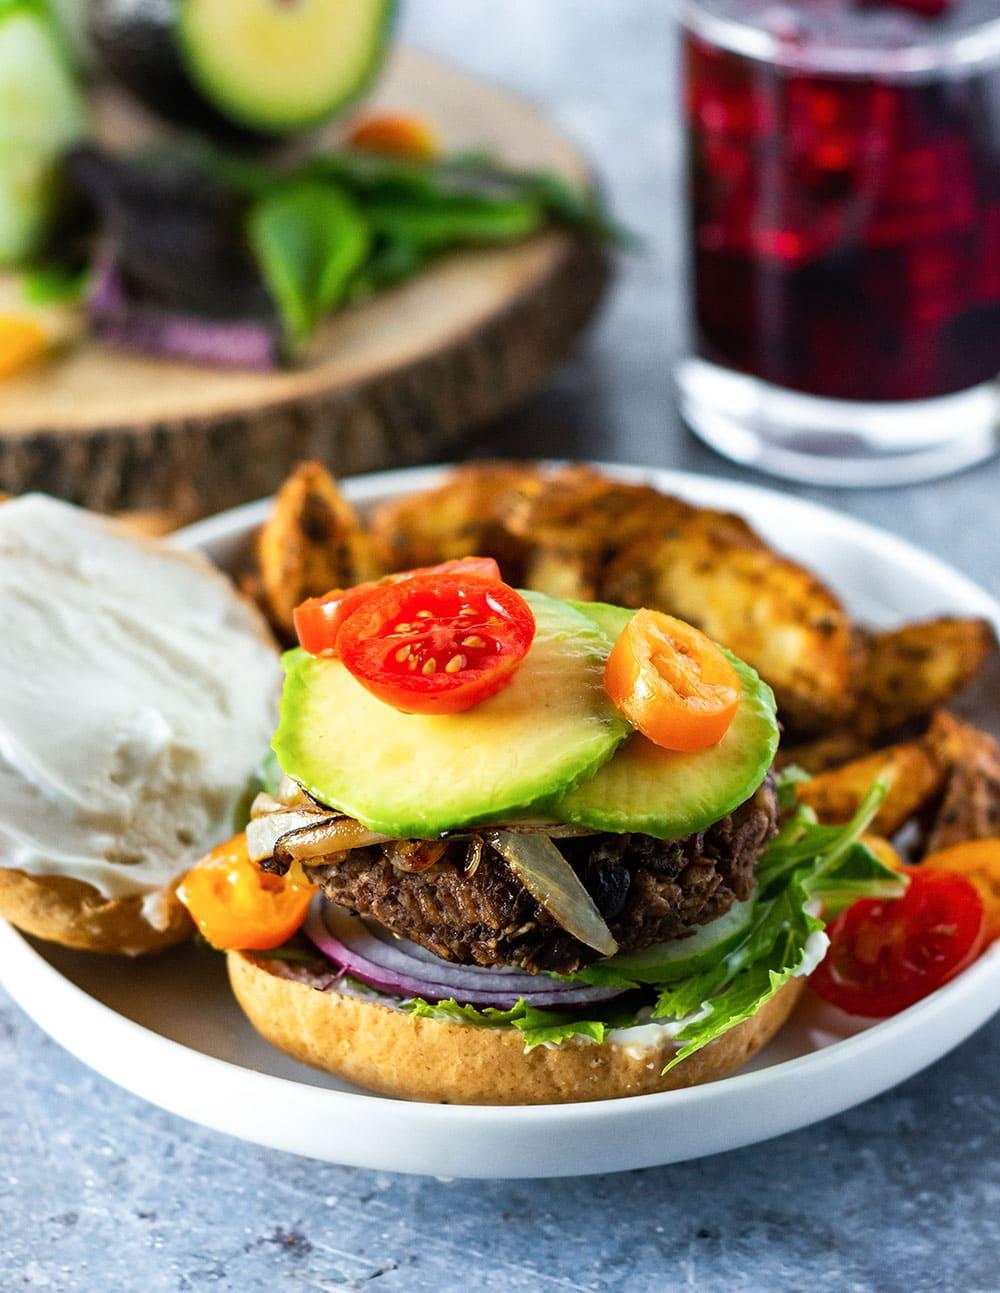 vegan black bean burger on gluten-free vegan bun, with mayo, red onion, caramelized onion, avocado, tomatoes